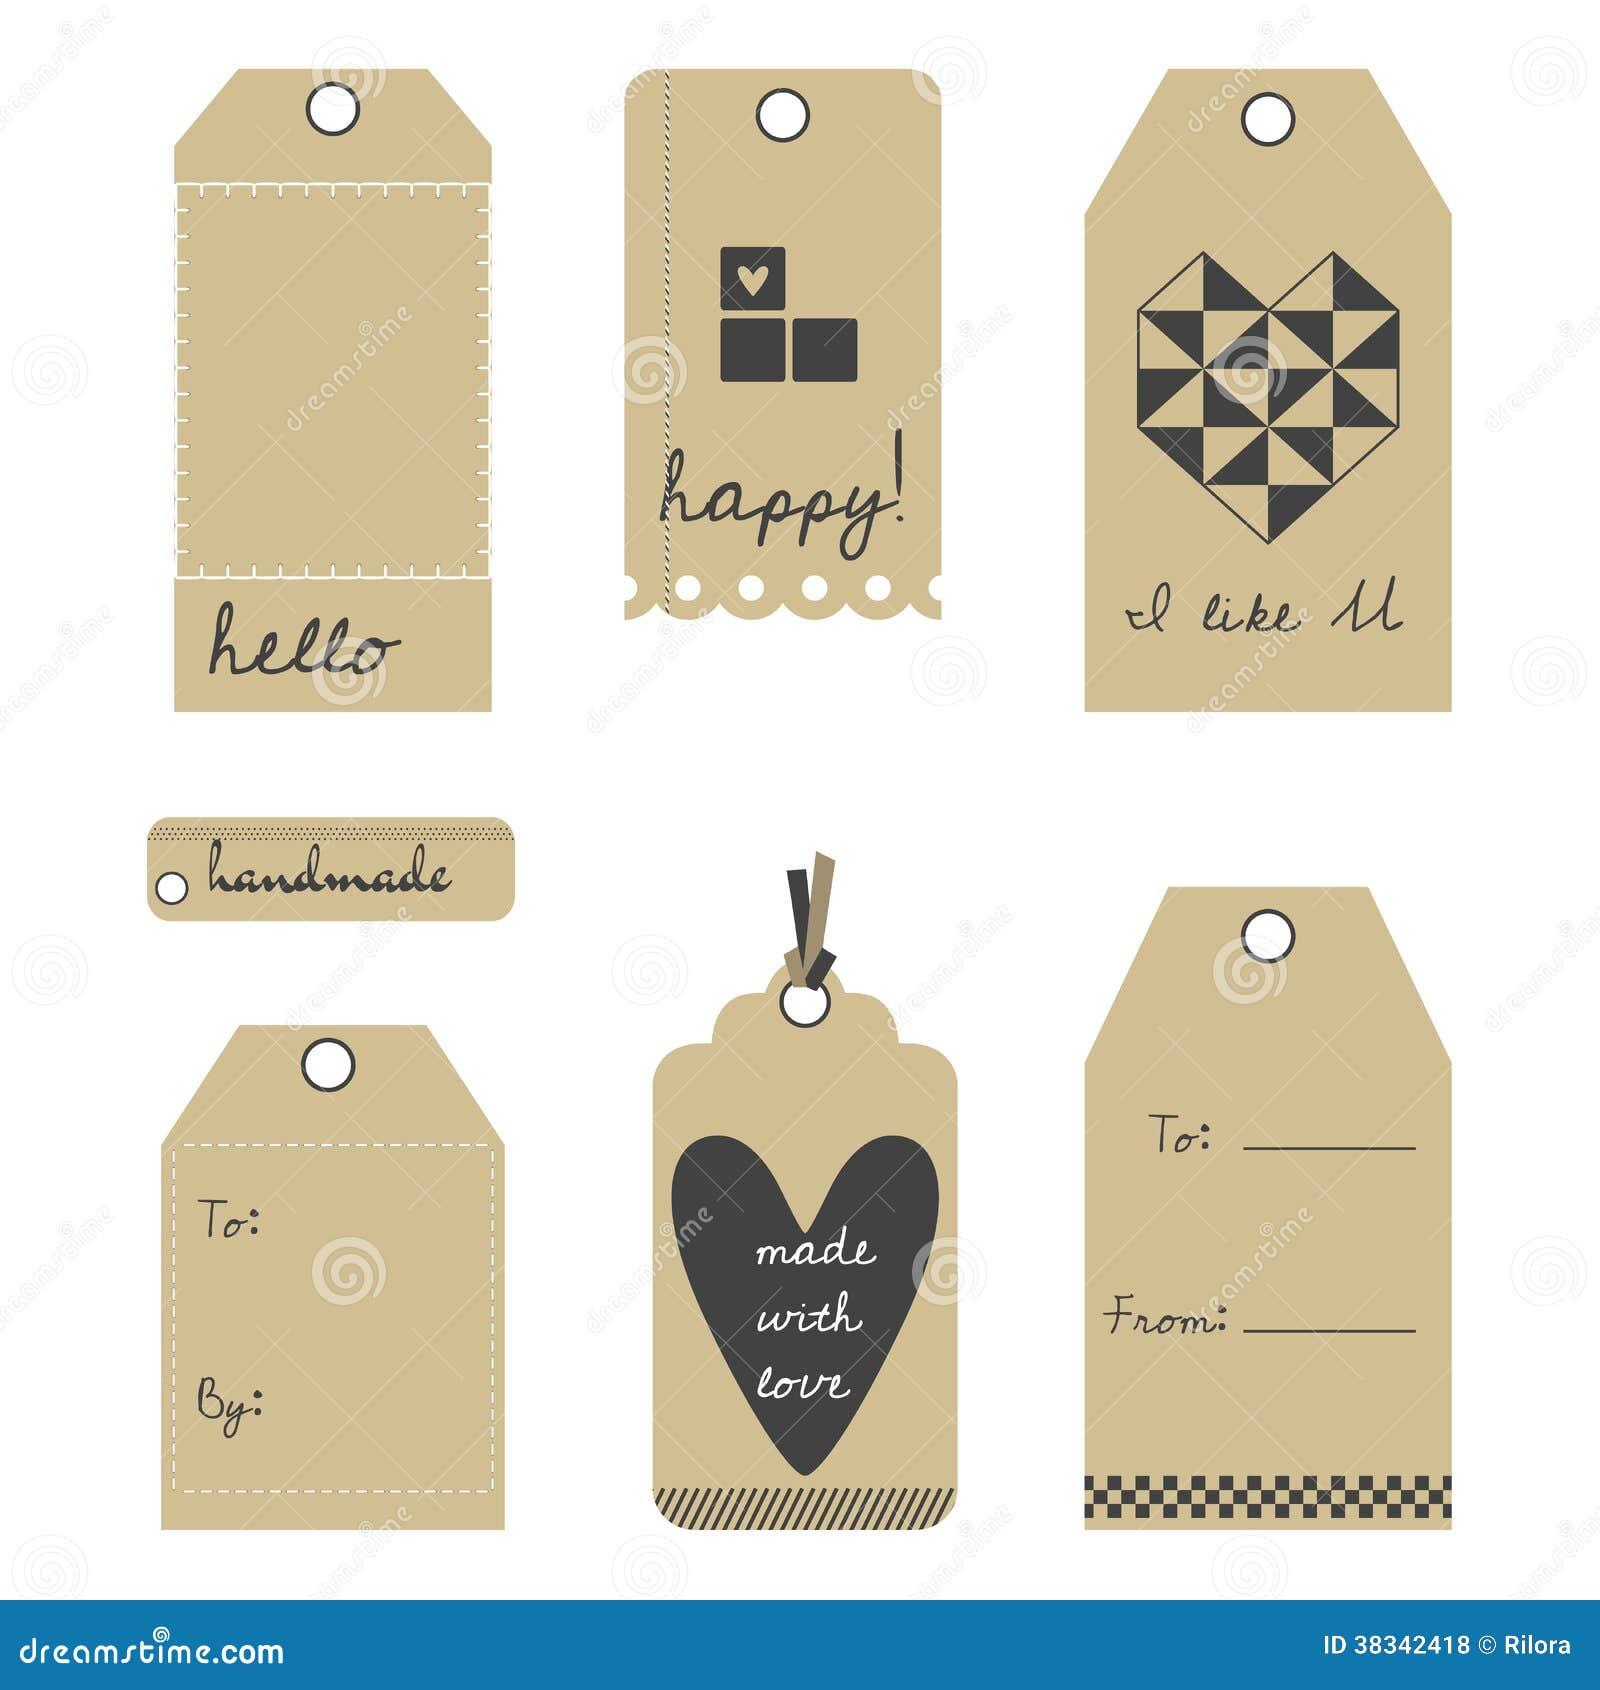 Wedding Gift Tag Free Download : Upps?ttning f?r f?r vektorg?vaetiketter eller etiketter. Denna ?r ...